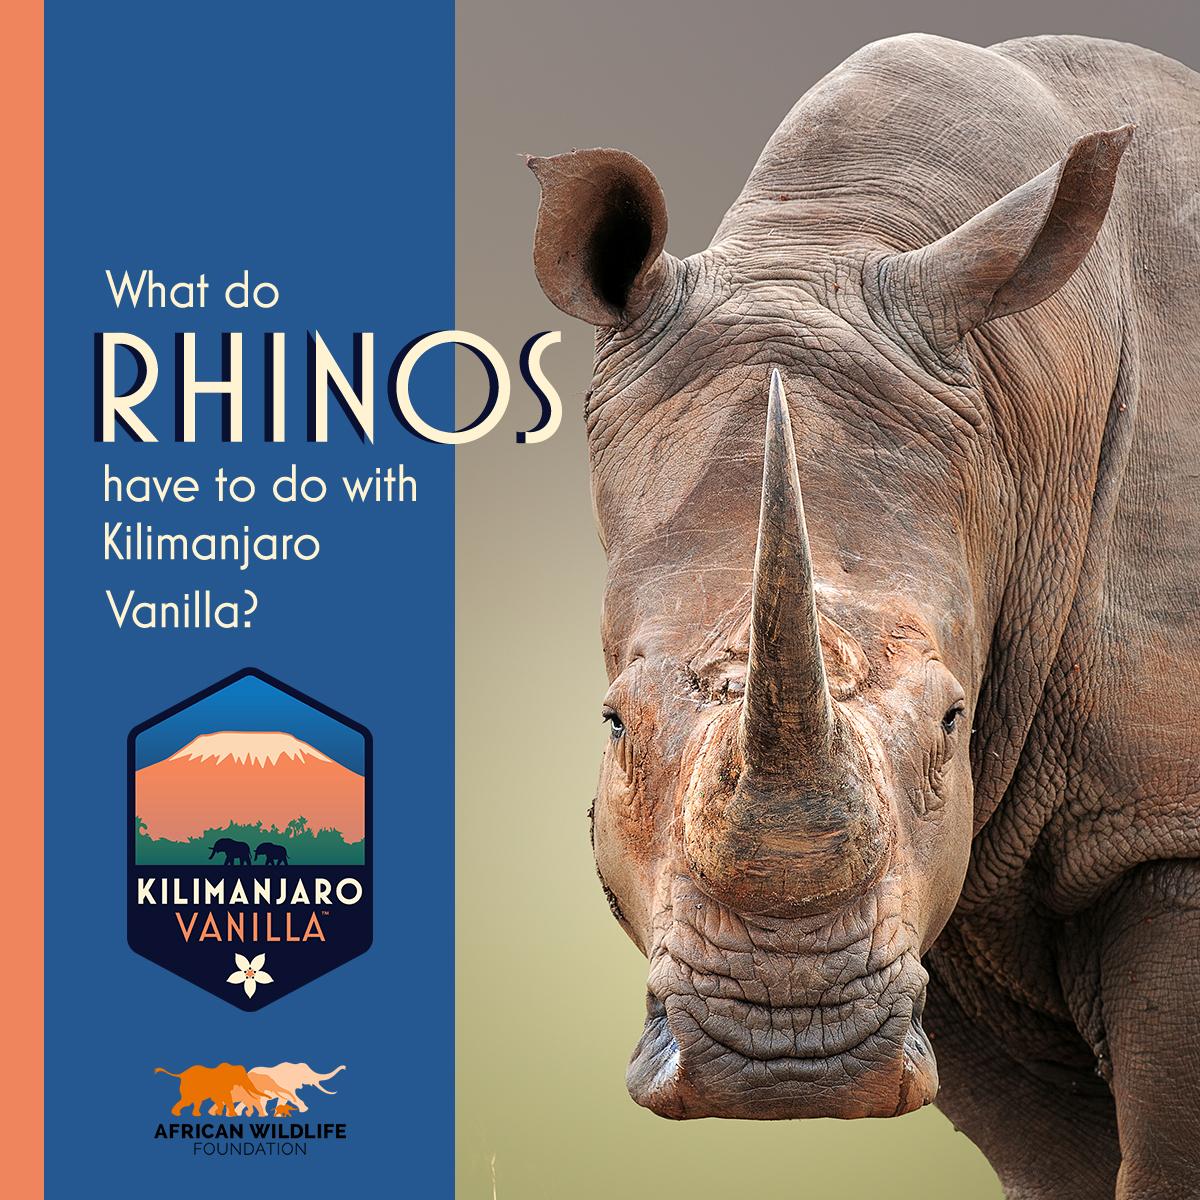 Kilimanjaro Vanilla Wildlife Teaser Rhinos